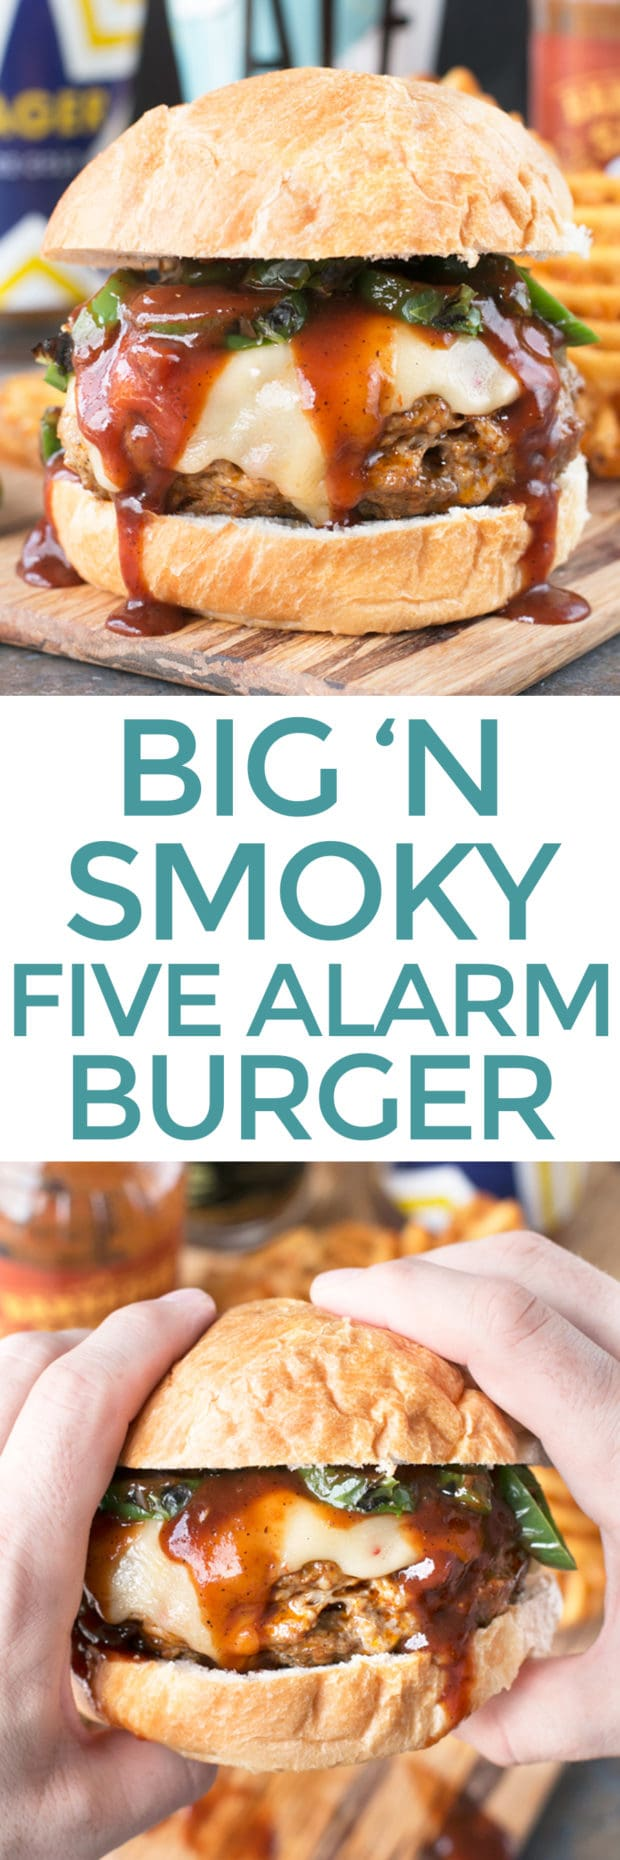 Big 'n Smoky Five Alarm Burger | cakenknife.com @sprouts #burger #grilling #summer #nationalhamburgerday